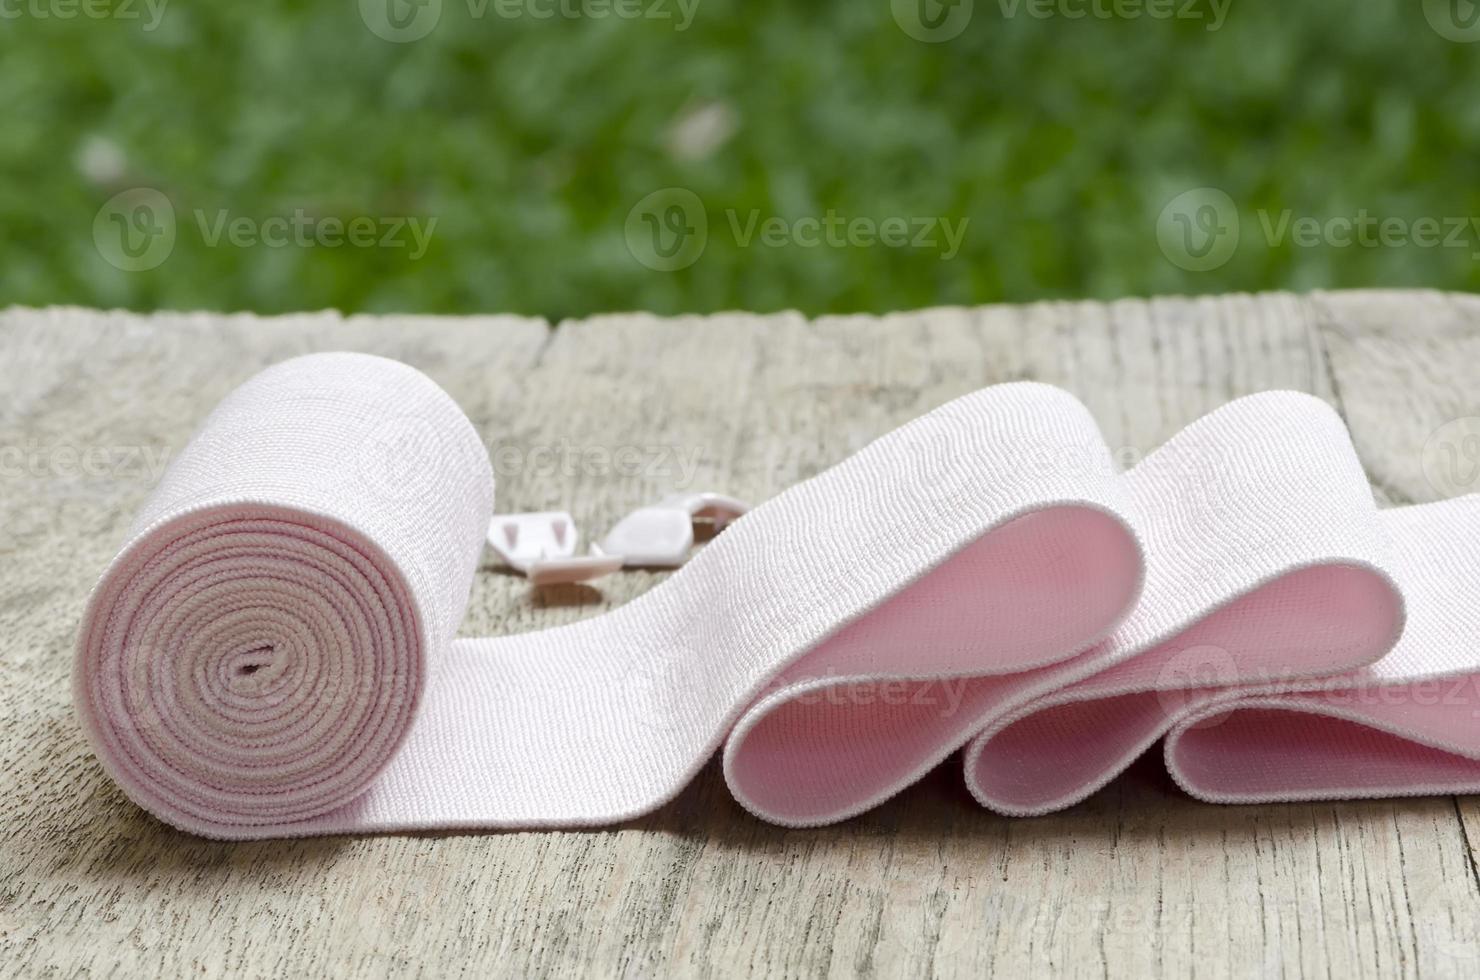 bendaggio elastico foto